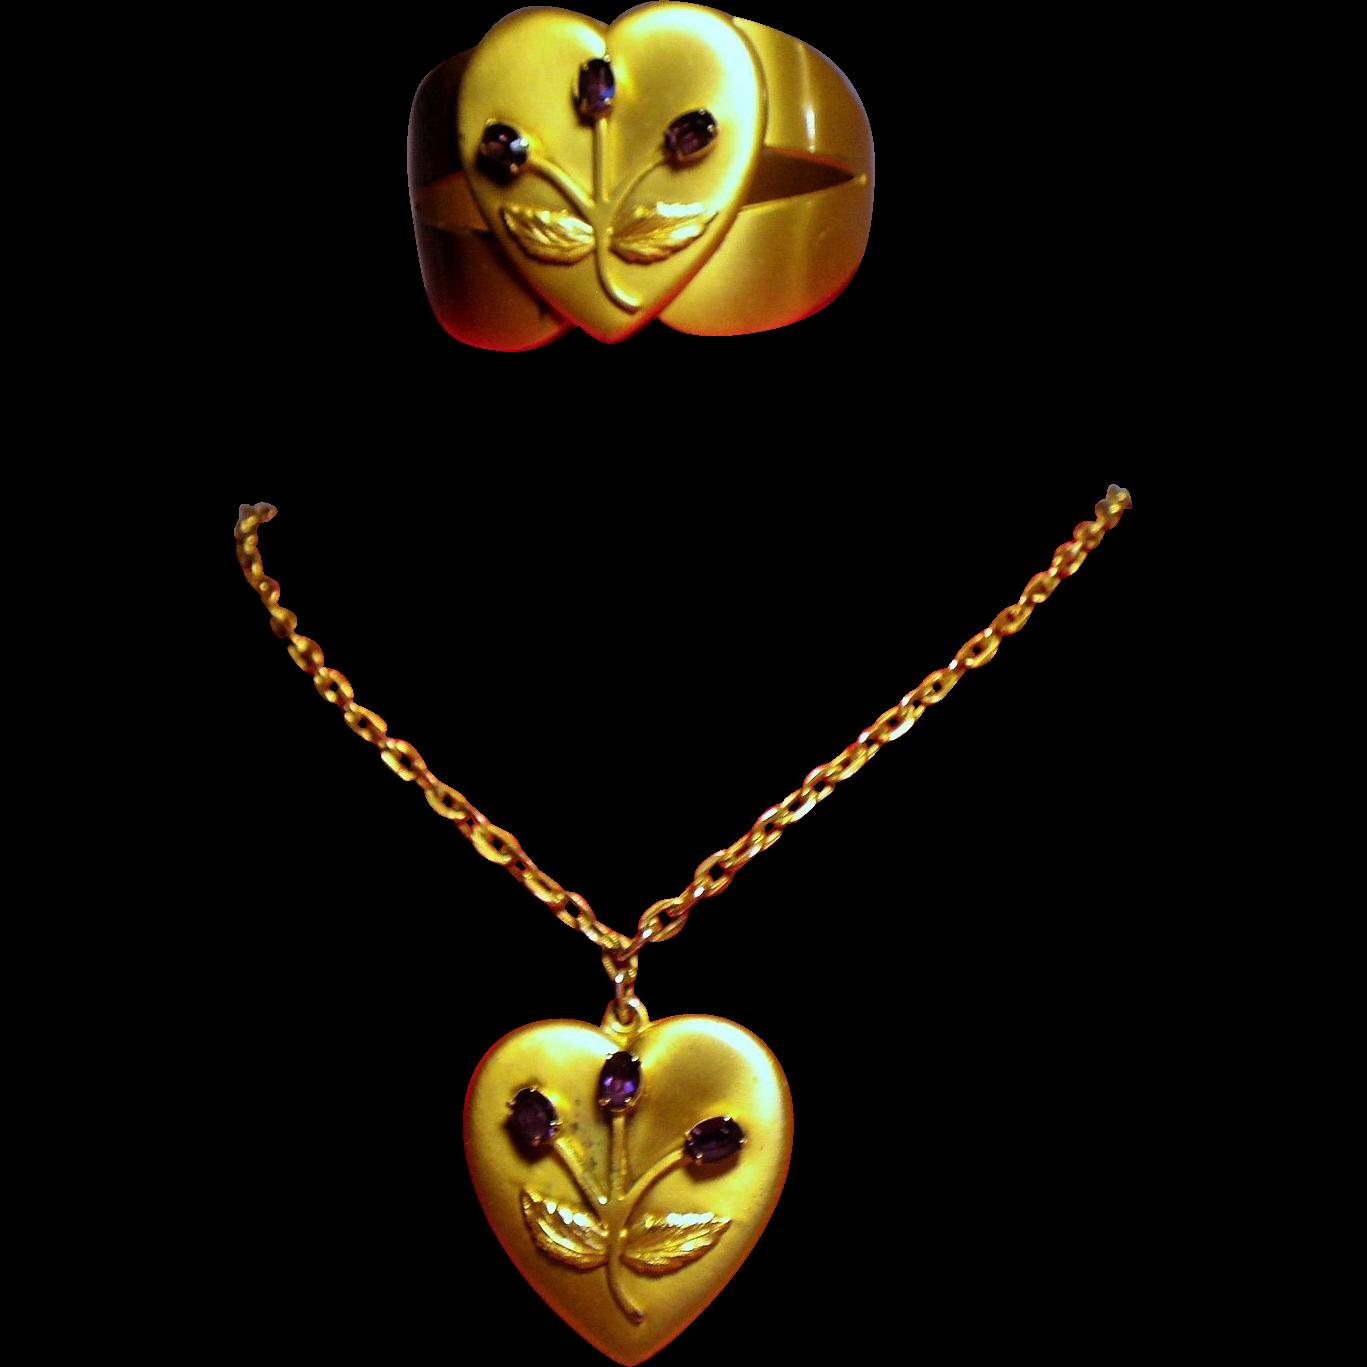 Vintage Heart Pendant Necklace Clamper Bracelet Amethyst Rhinestones Demi Parure